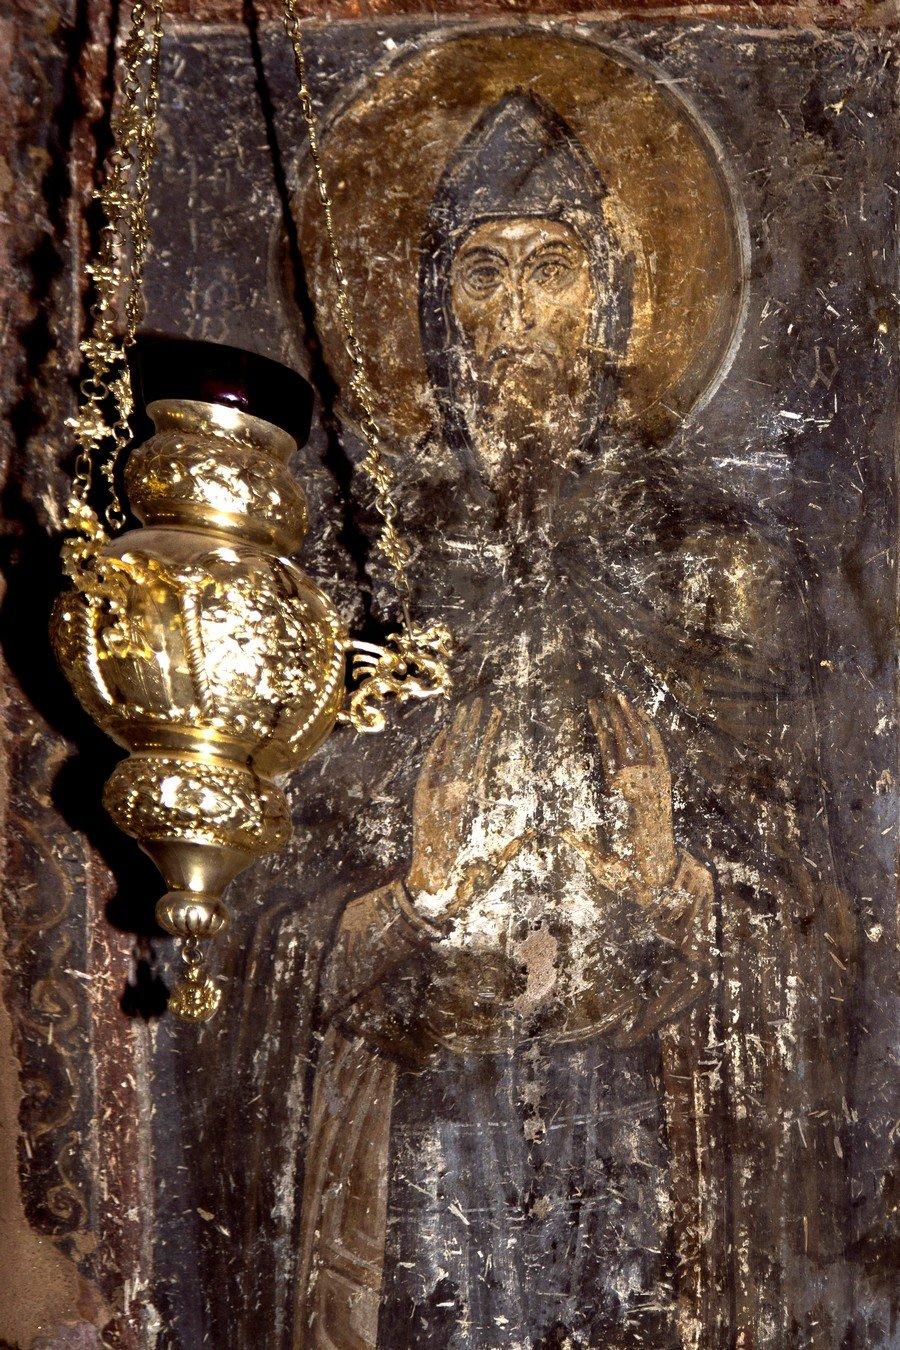 Святой Преподобный Лука Елладский. Фреска церкви Святого Димитрия в Салониках, Греция. XII век.